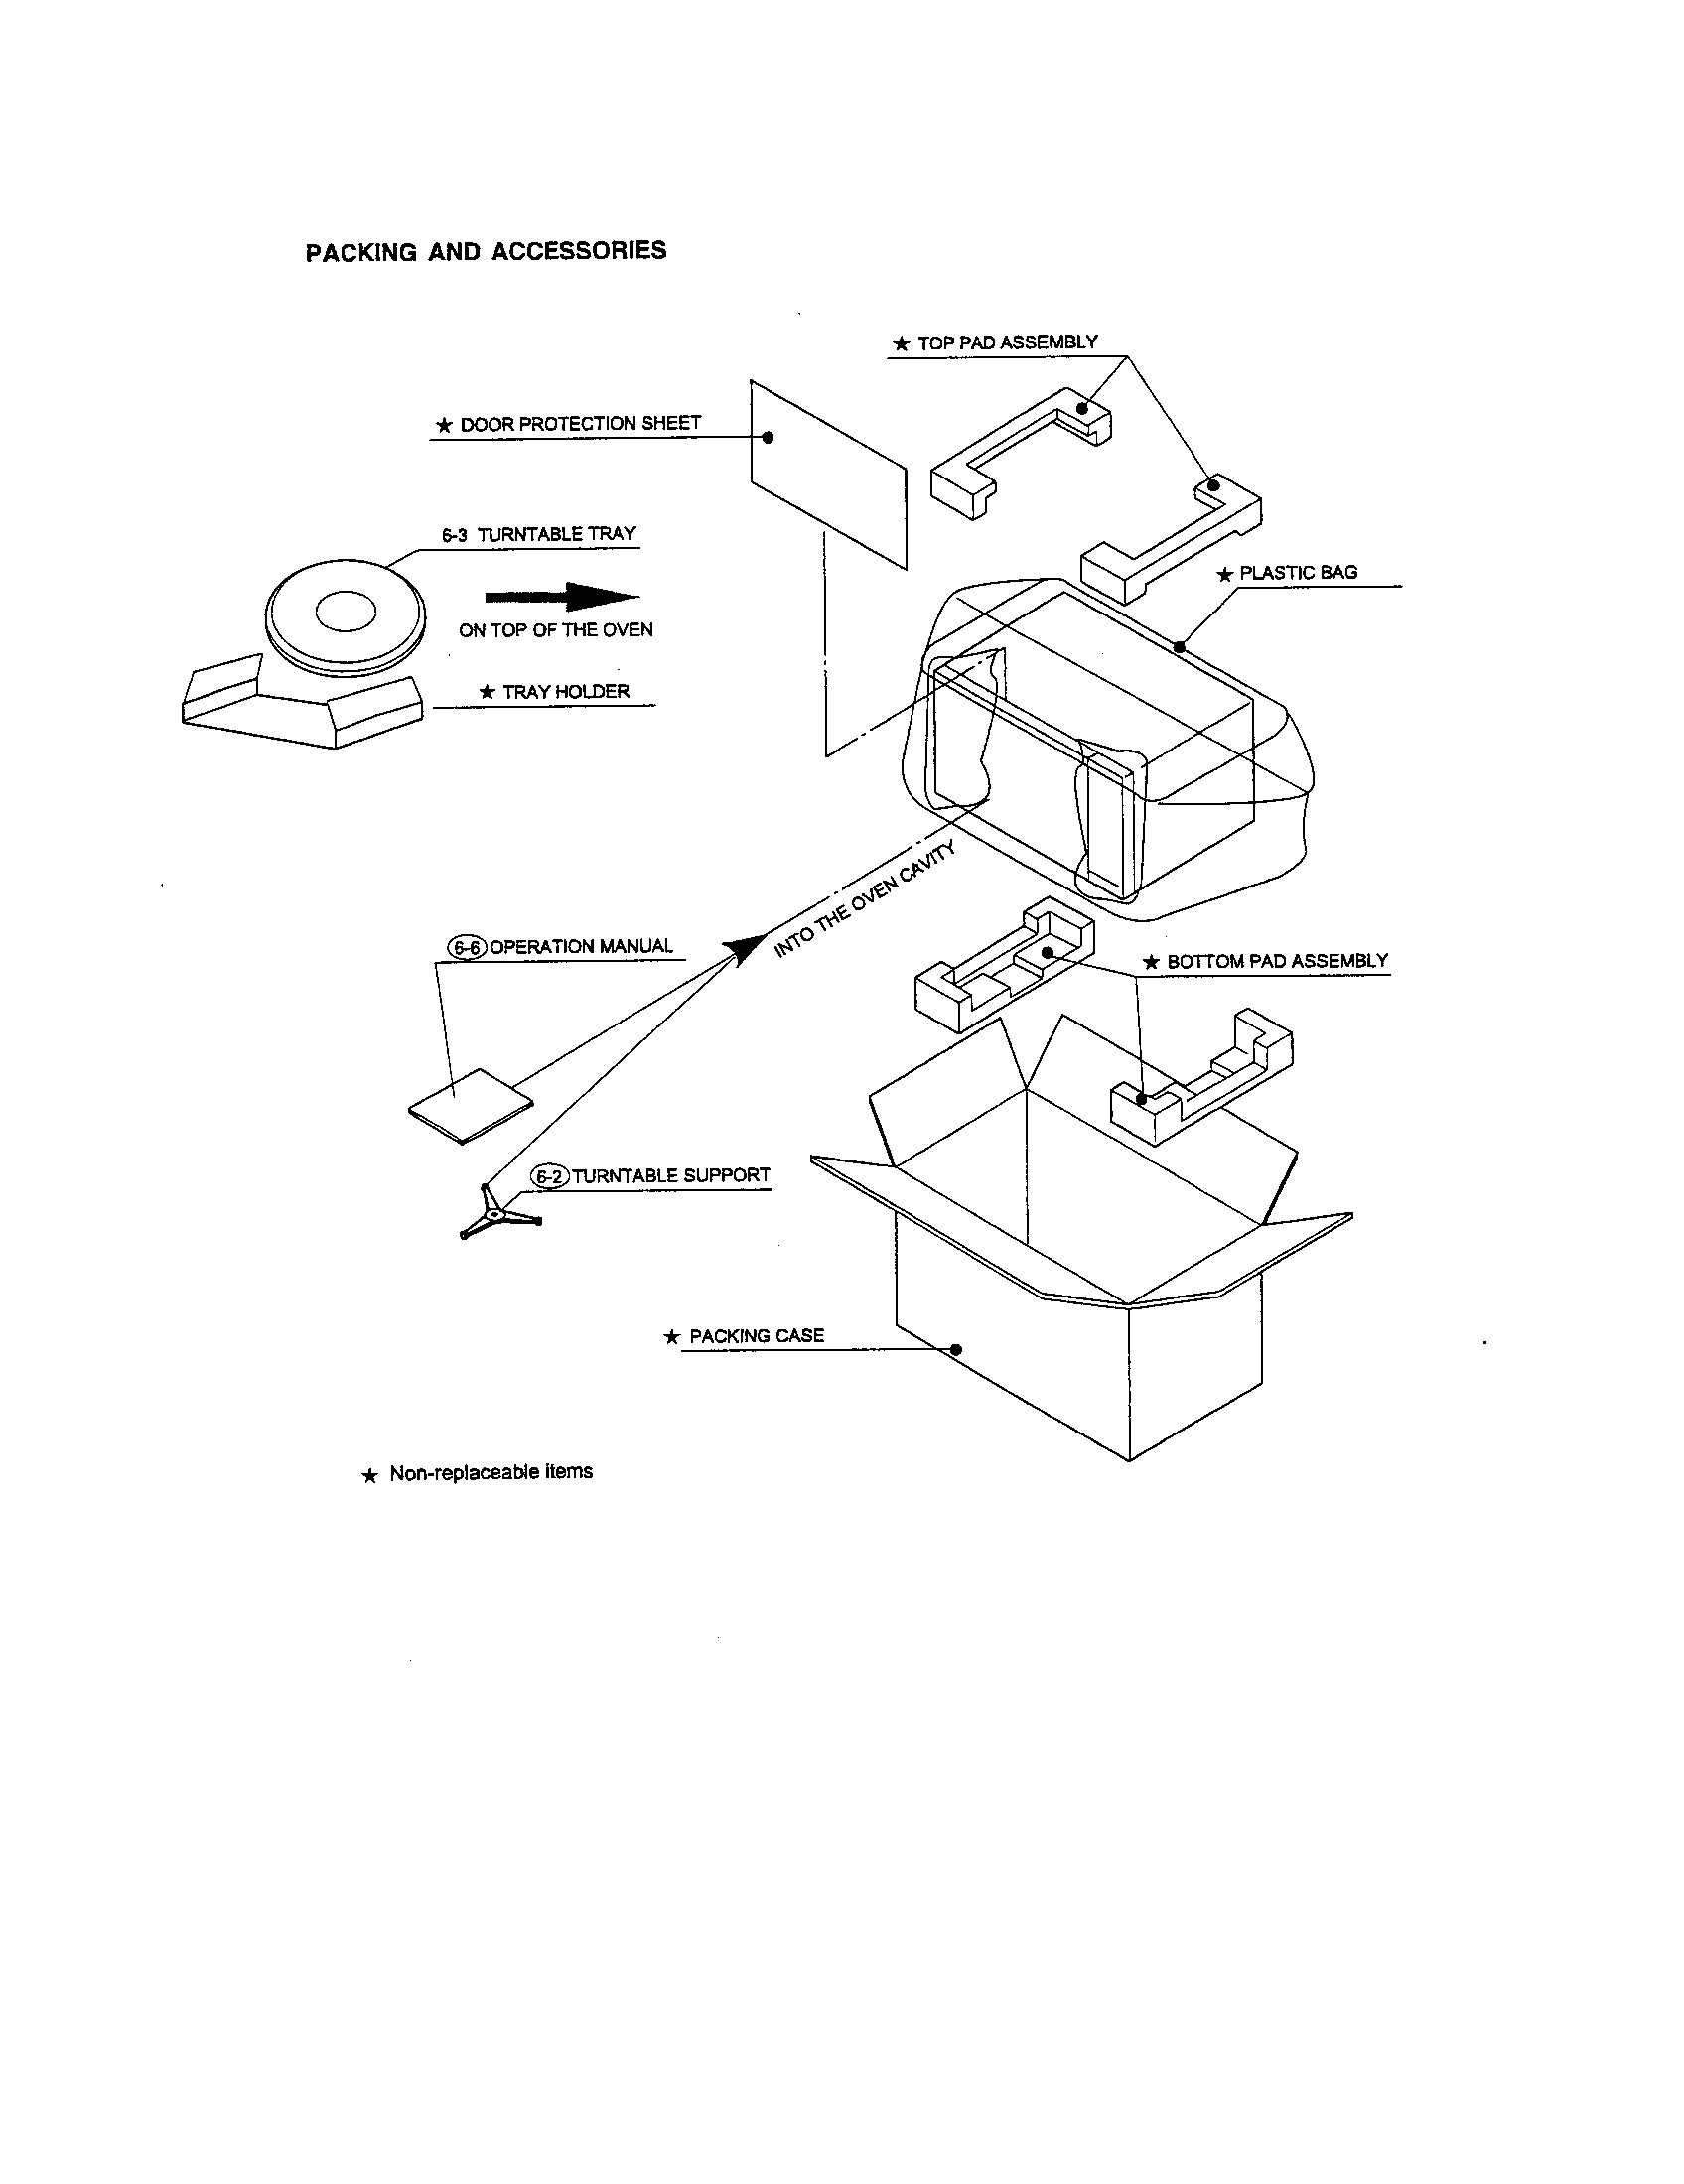 Sharp model R-428JK countertop microwave genuine parts